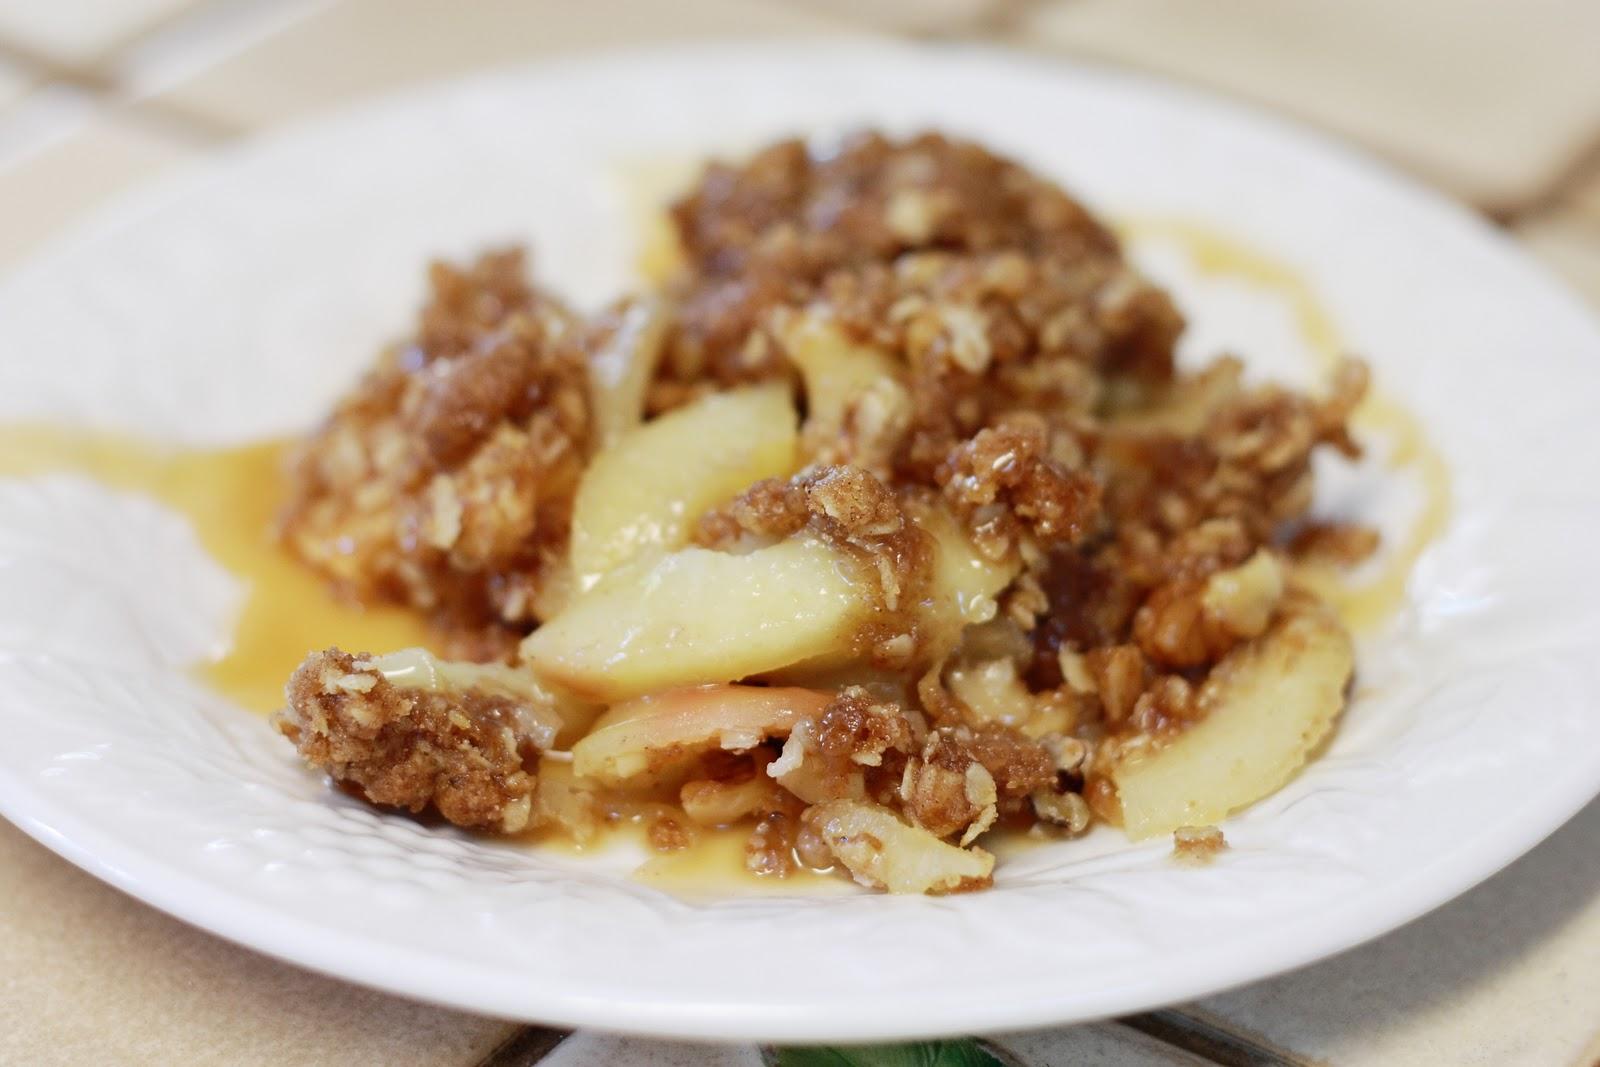 Gluten-Free & Vegan Apple Crisp Dessert